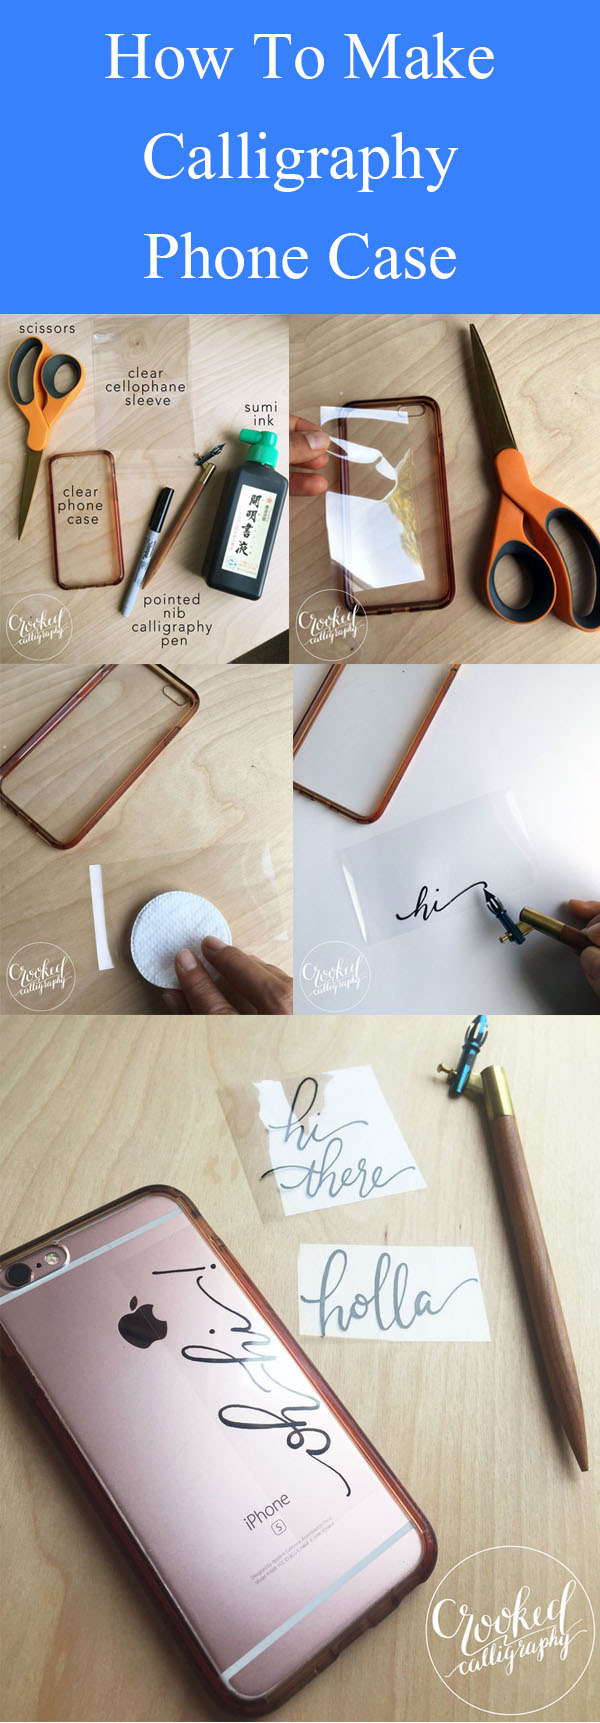 DIY Calligraphy Phone Case